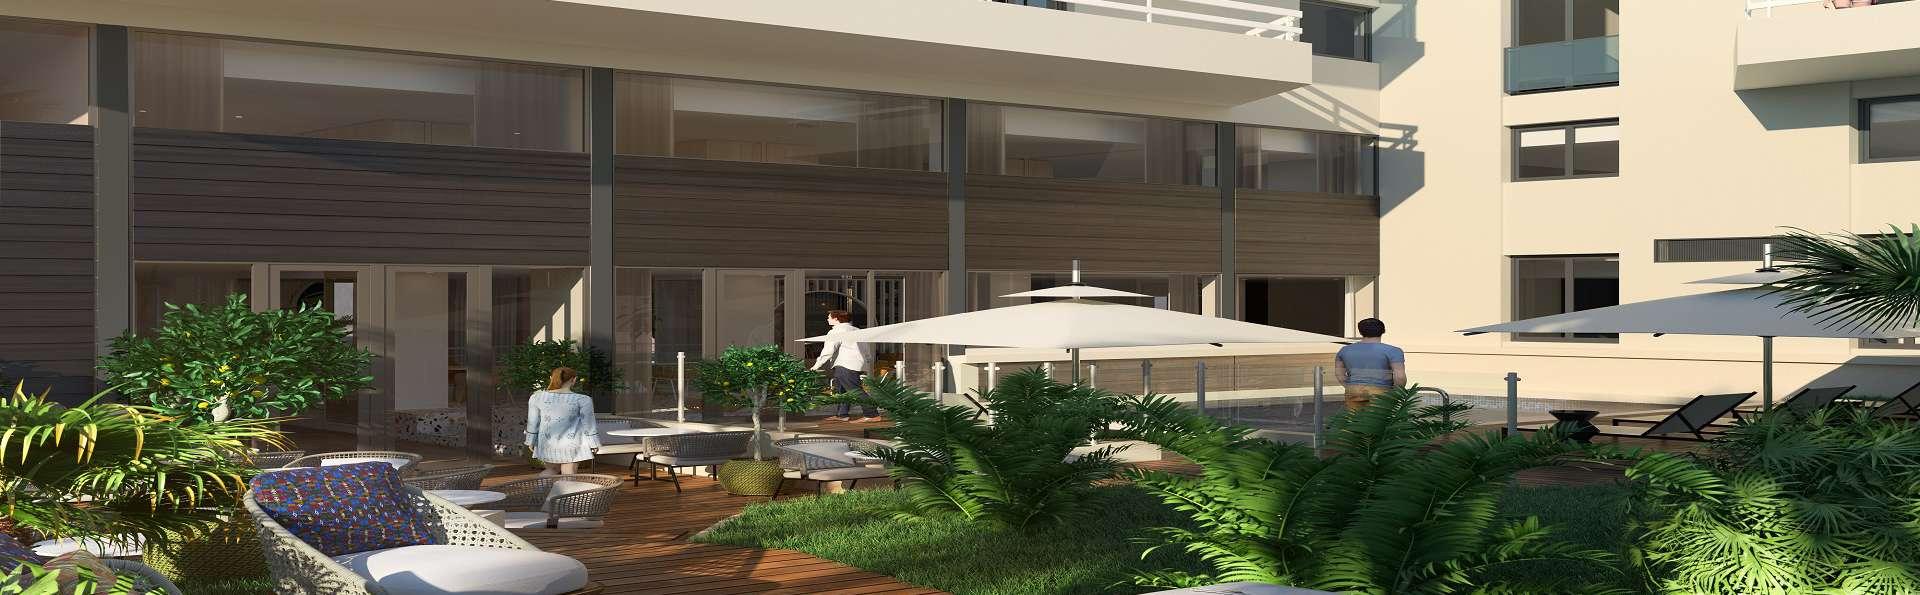 Hotel Croisette Beach Cannes MGallery By Sofitel - PISCINE___JARDIN.jpg